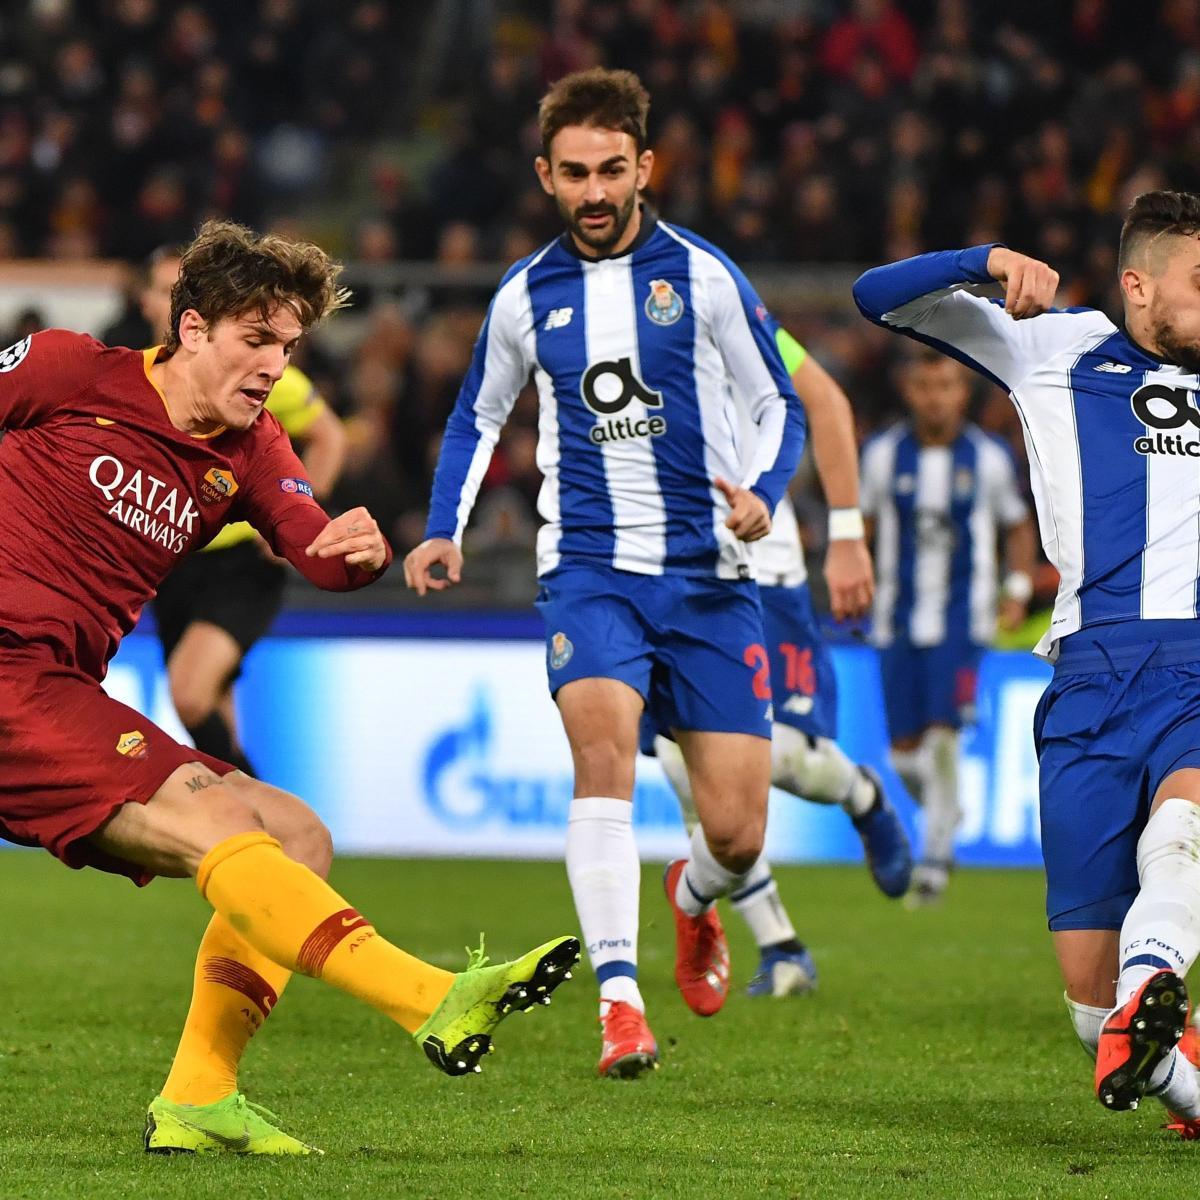 Champions League 2019 Round Of 16 Leg 2 Live Stream Tv: FC Porto Vs. AS Roma Leg 2: How To Watch, Live-Stream Info